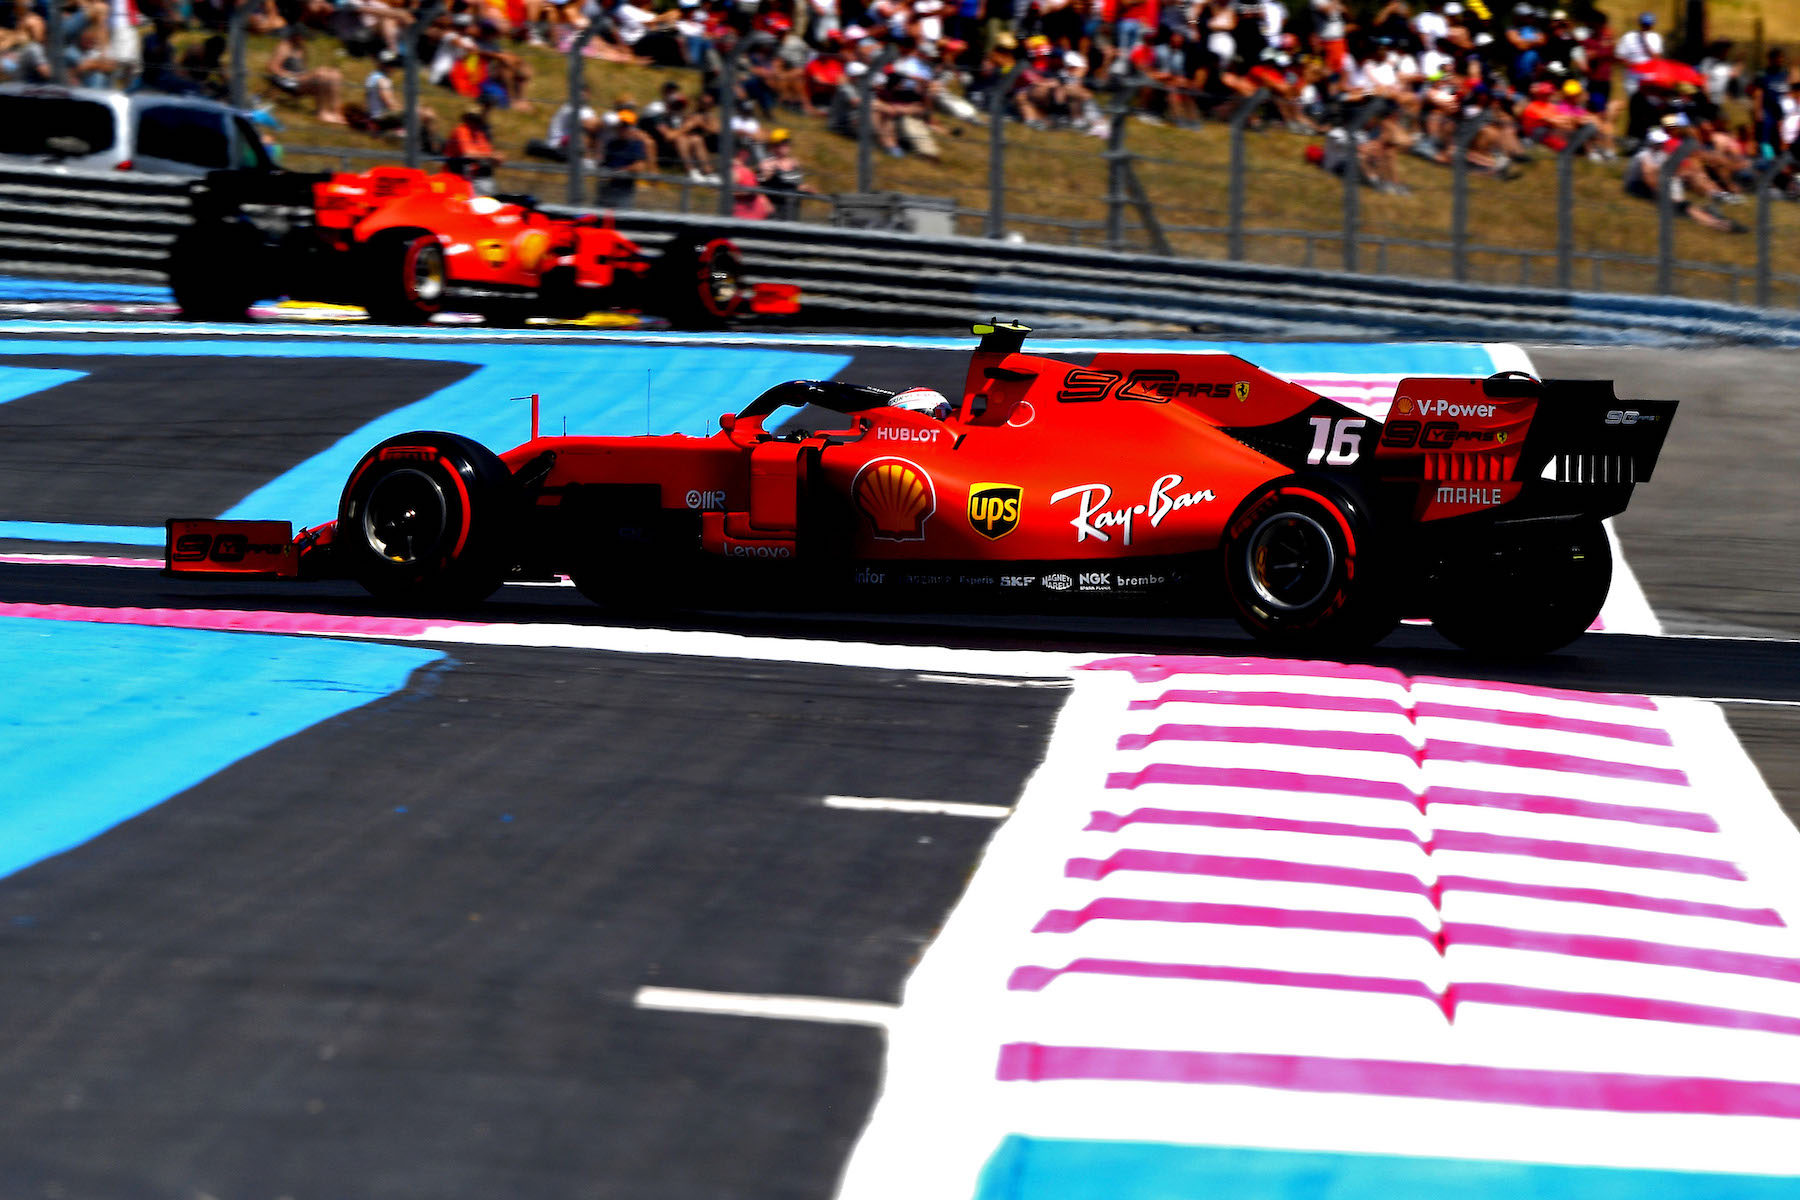 1 2019 French GP Friday 3.jpg